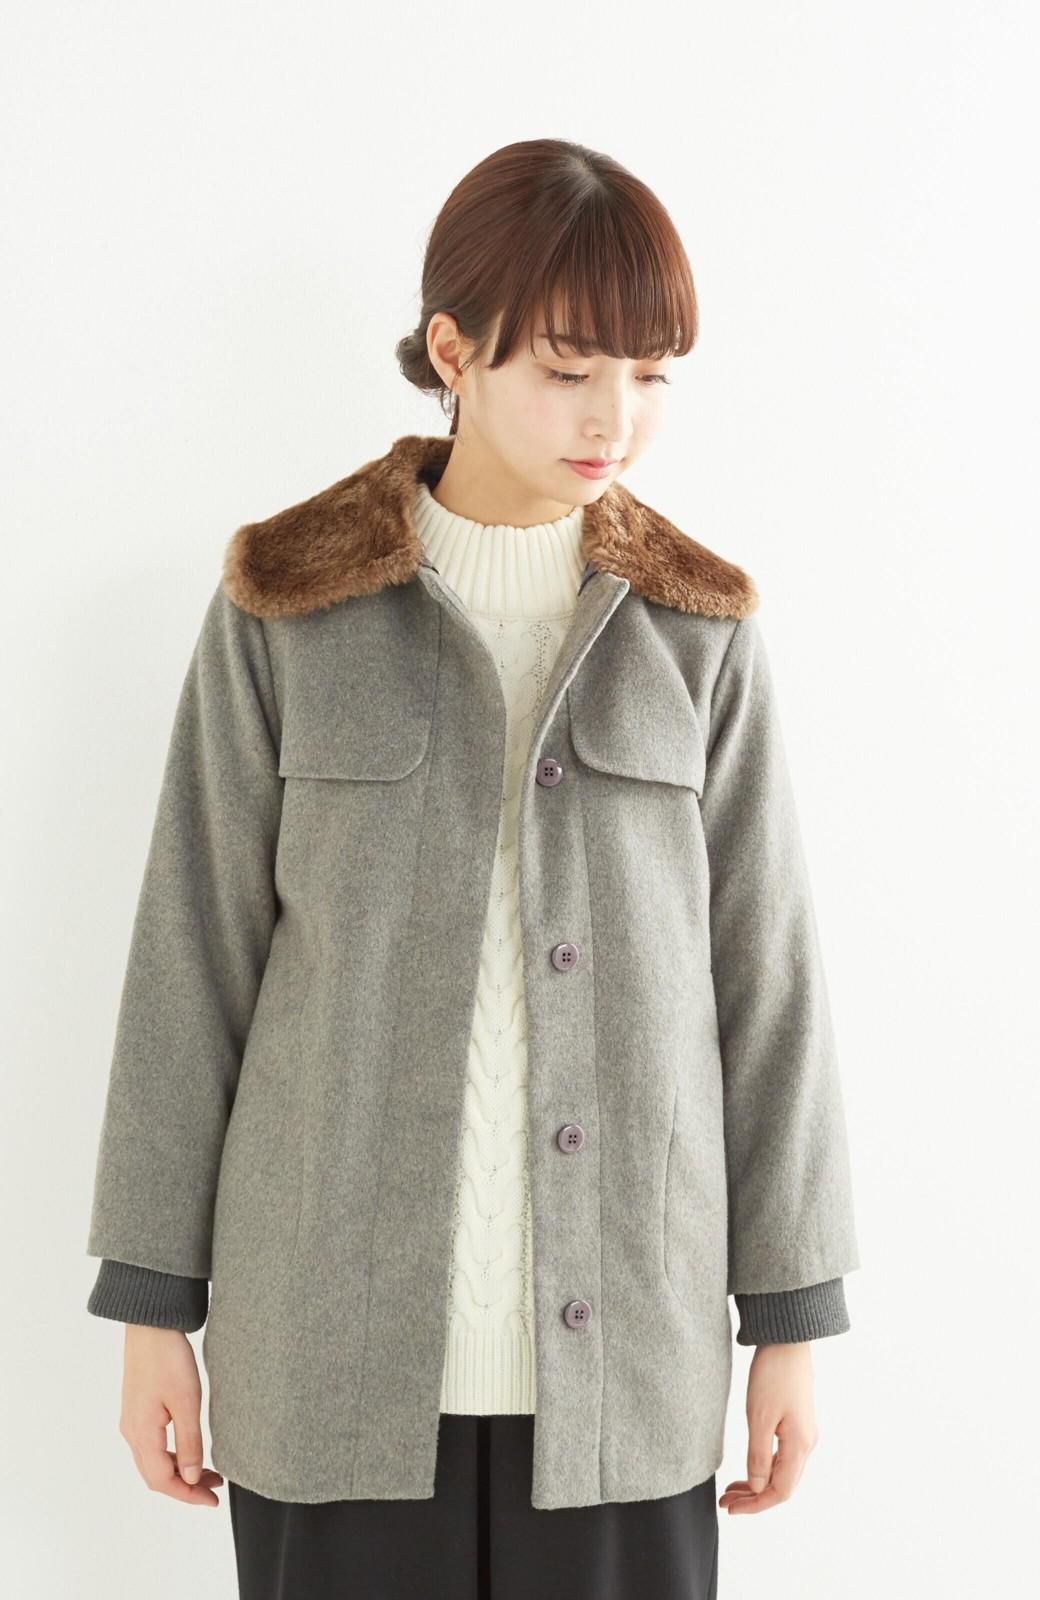 pilvee 取り外しフェイクファー衿付き ウール混のノーカラーコート <グレー>の商品写真13